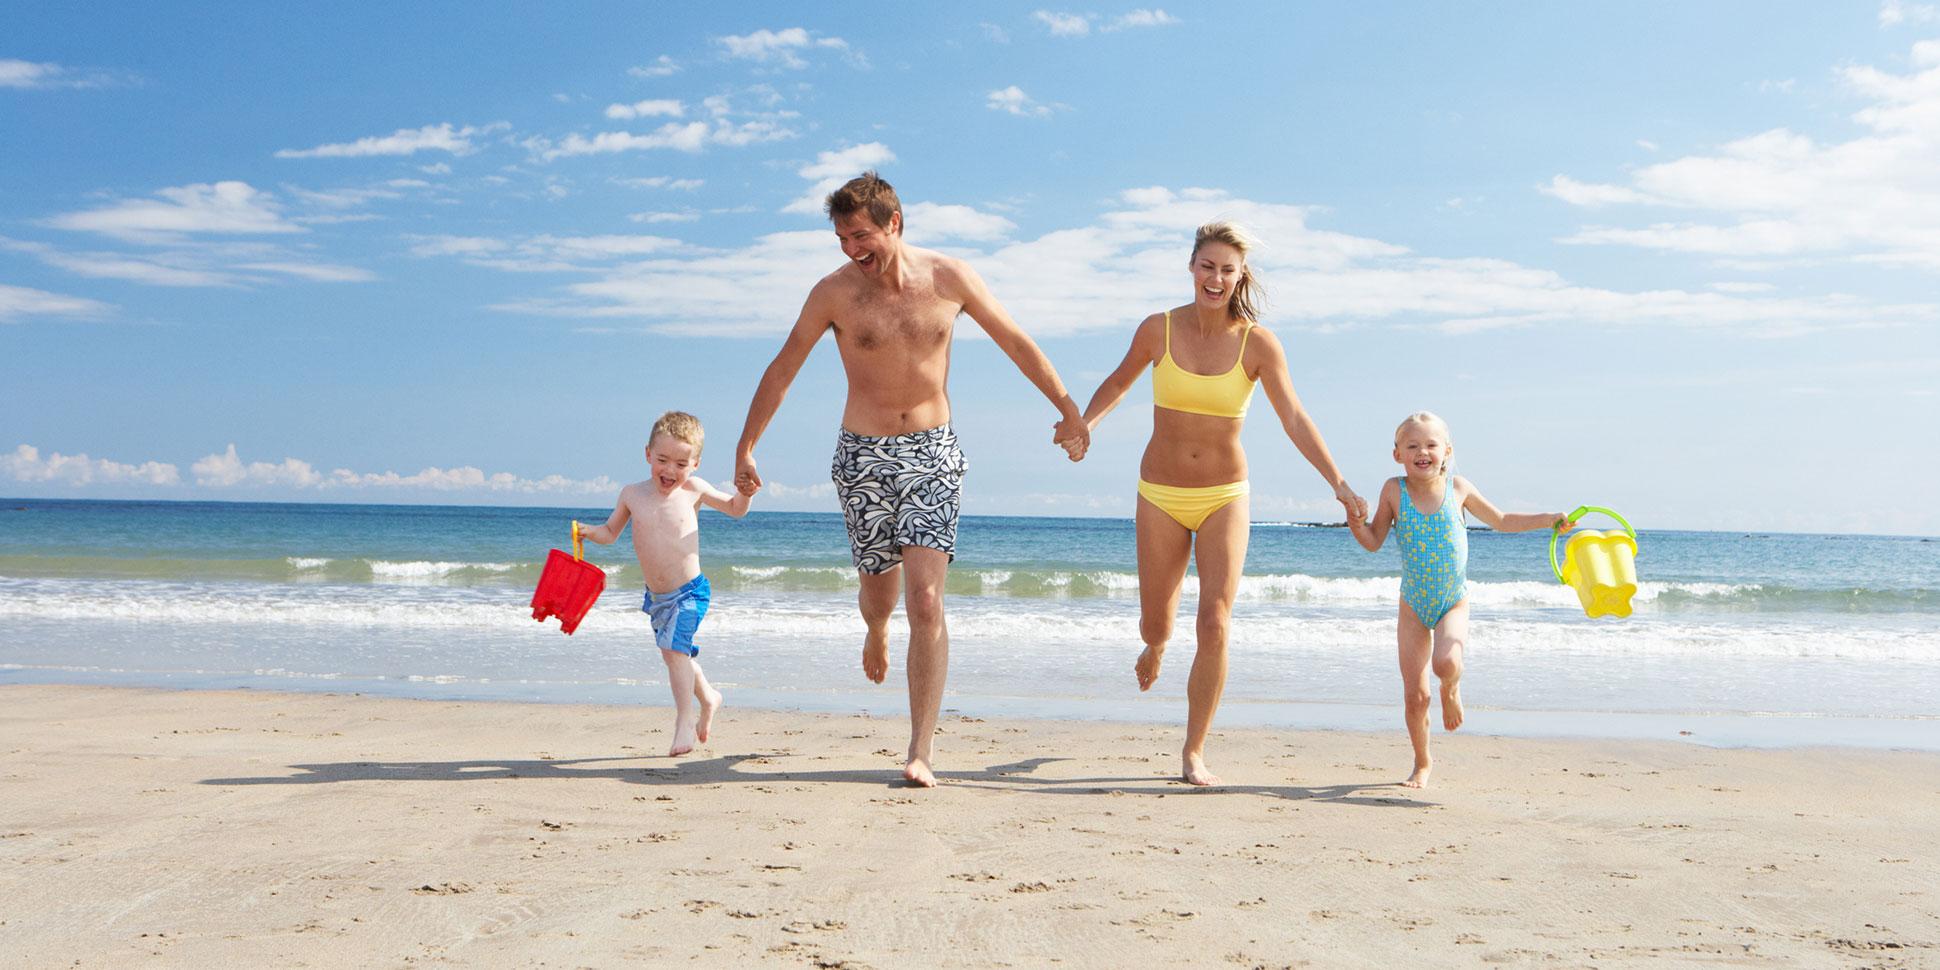 Beach Side Hotels In Cocoa Beach Florida